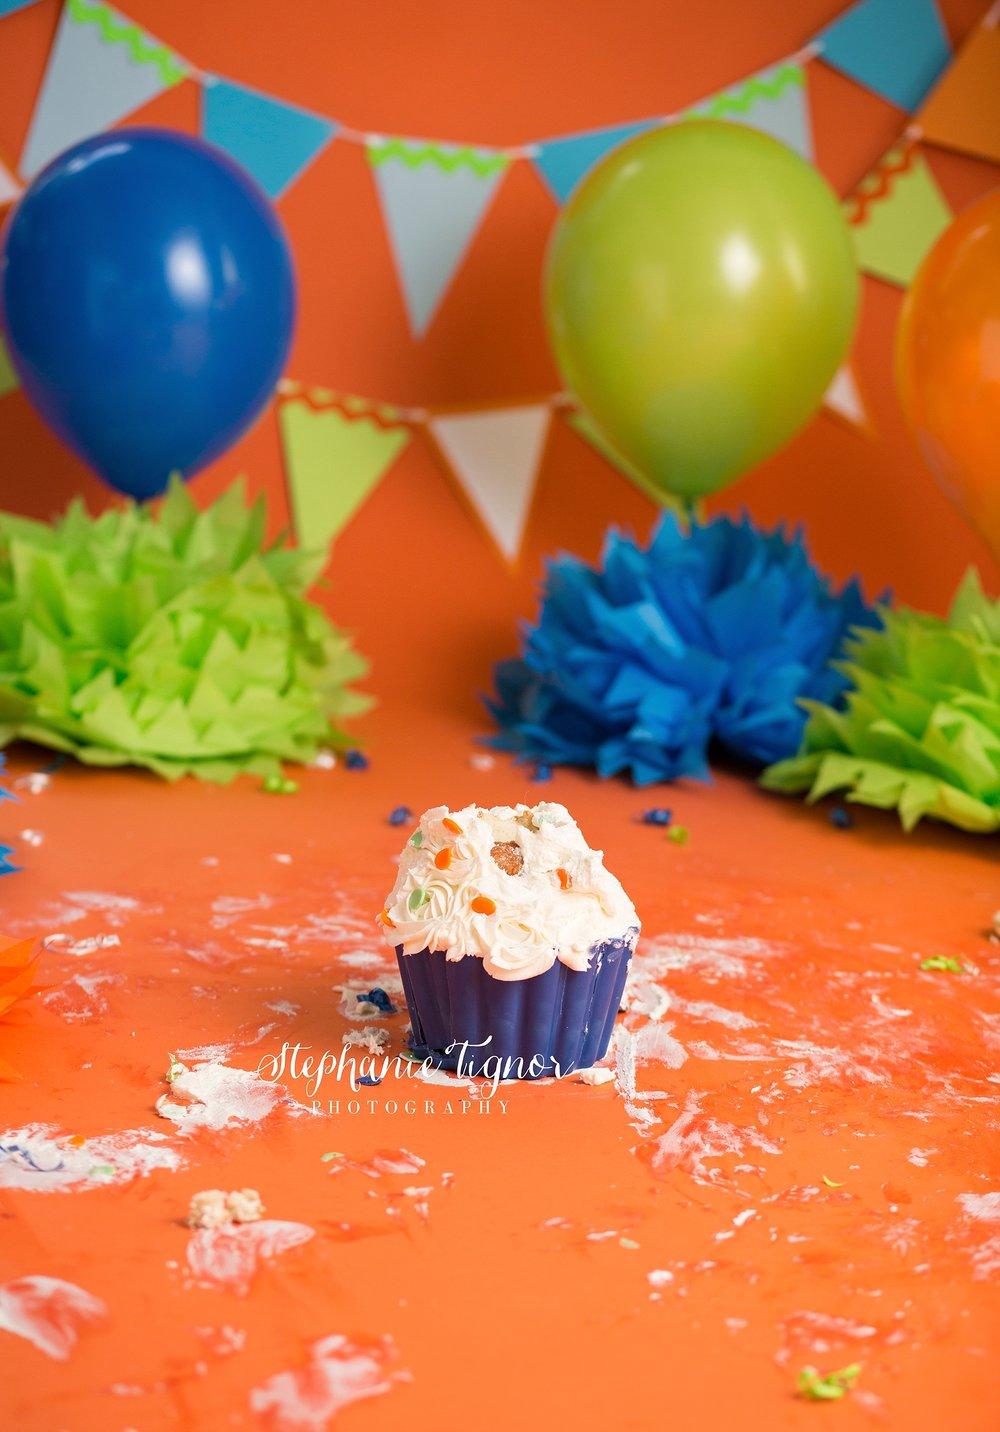 Stephanie Tignor Photography   Fredericksburg VA Cake Smash Photographer   Warrenton VA Cake Smash Photographer   Stafford VA Cake Smash Photographer   Cake Smash Photographer